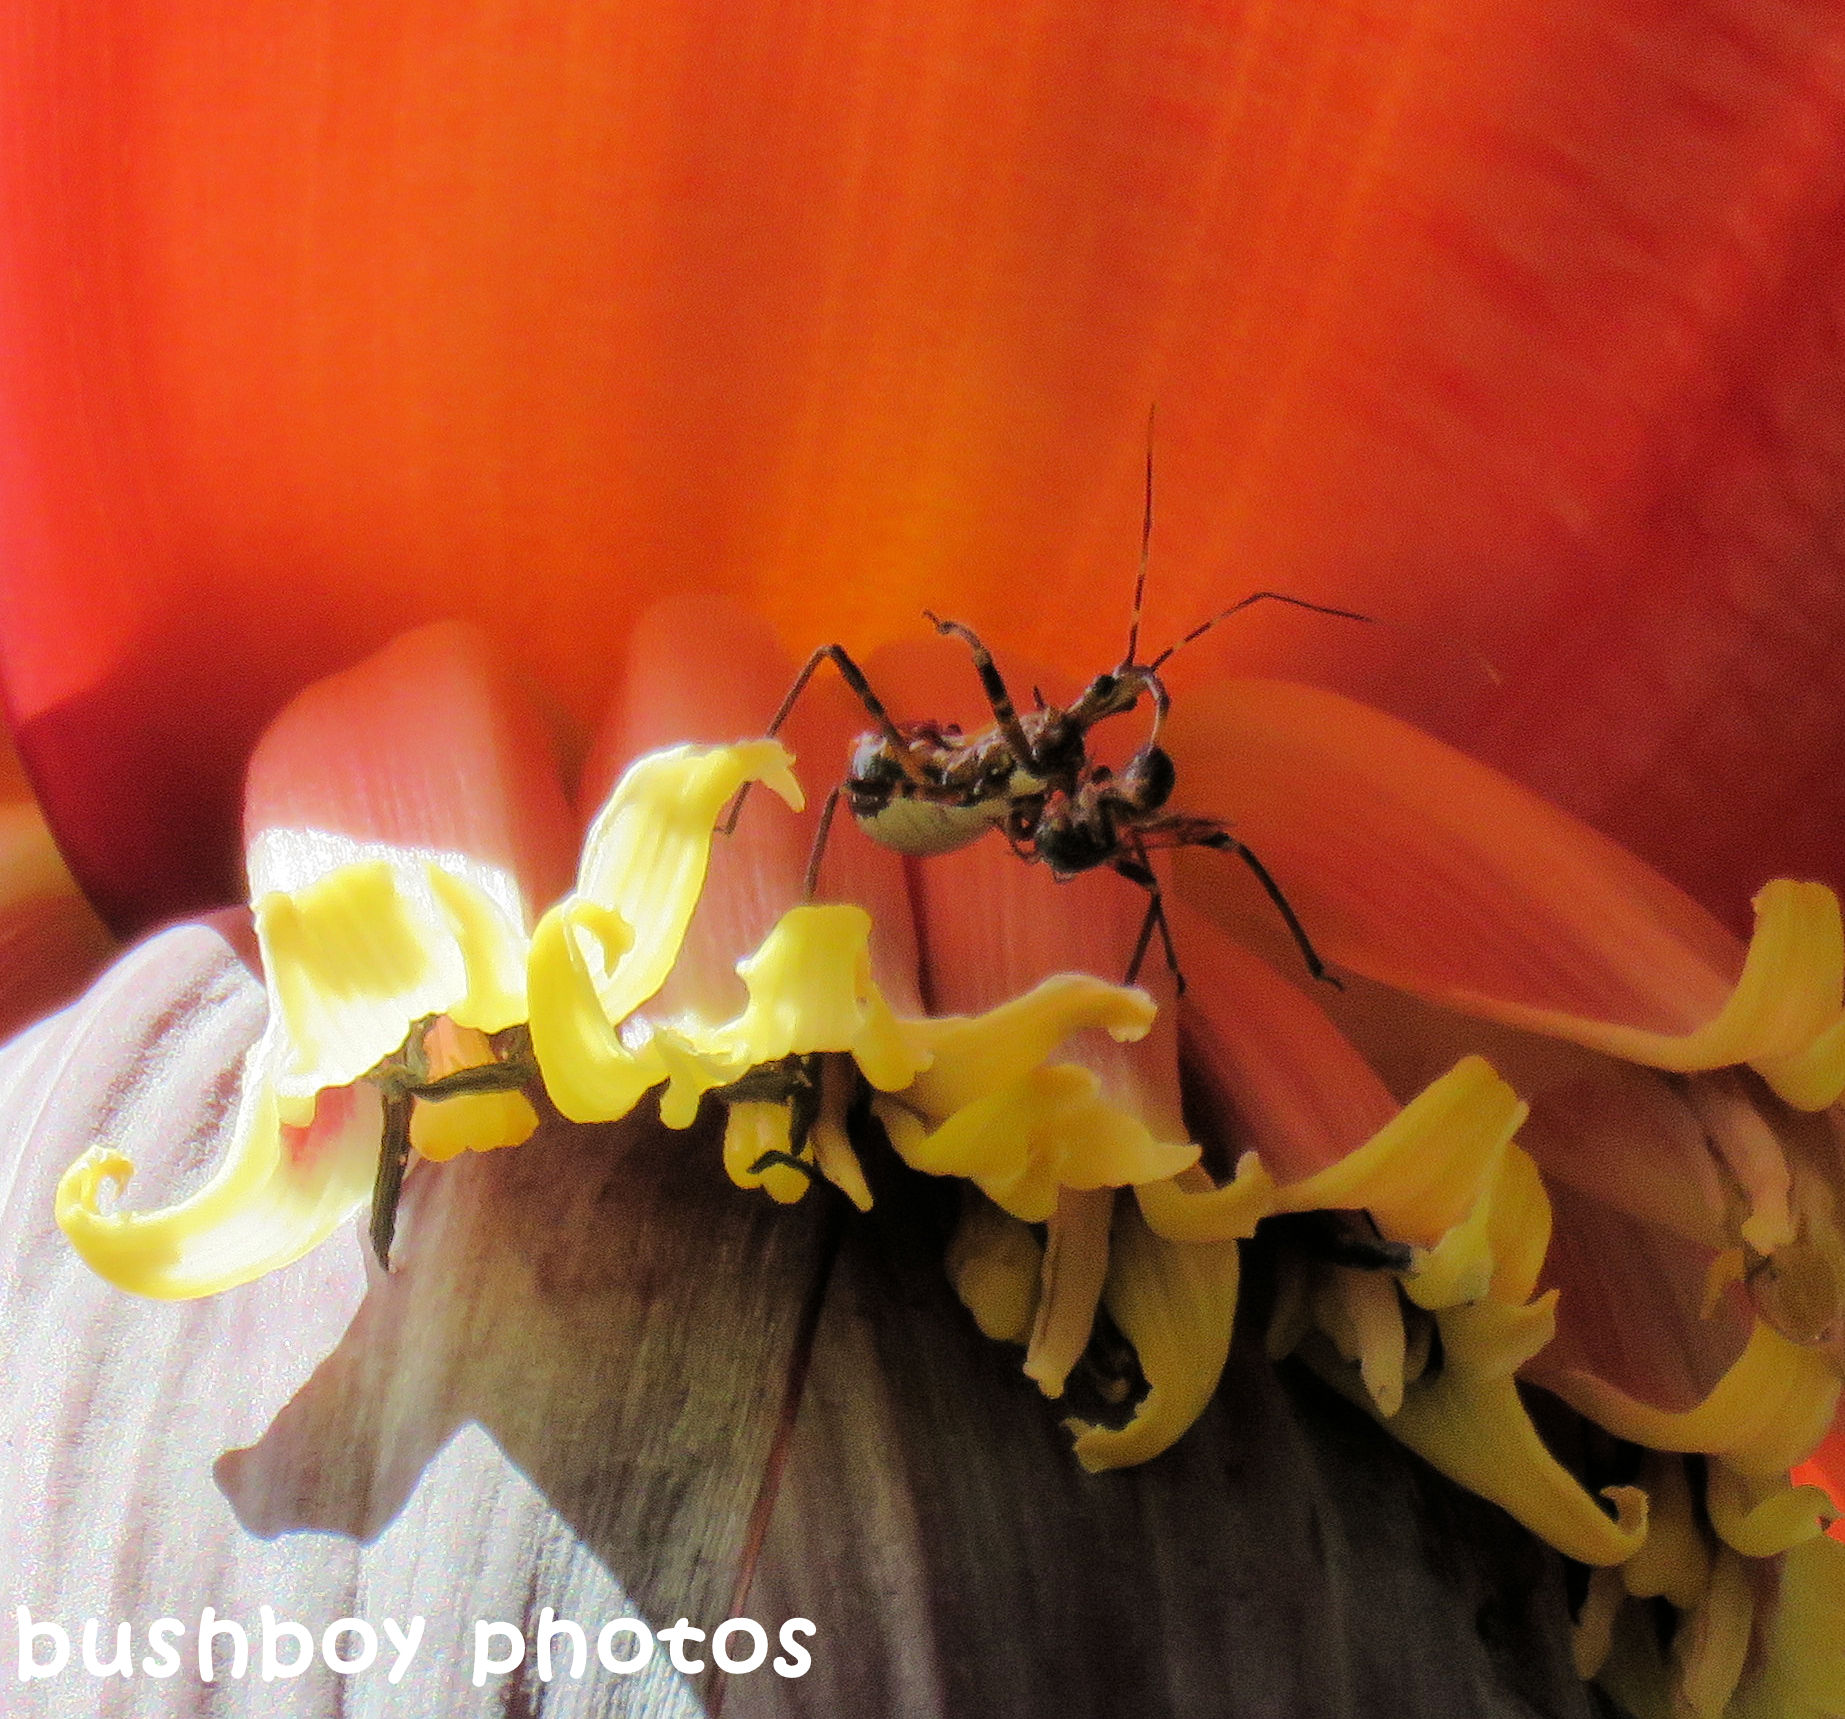 170917_blog challenge_six word saturday_asassin bug